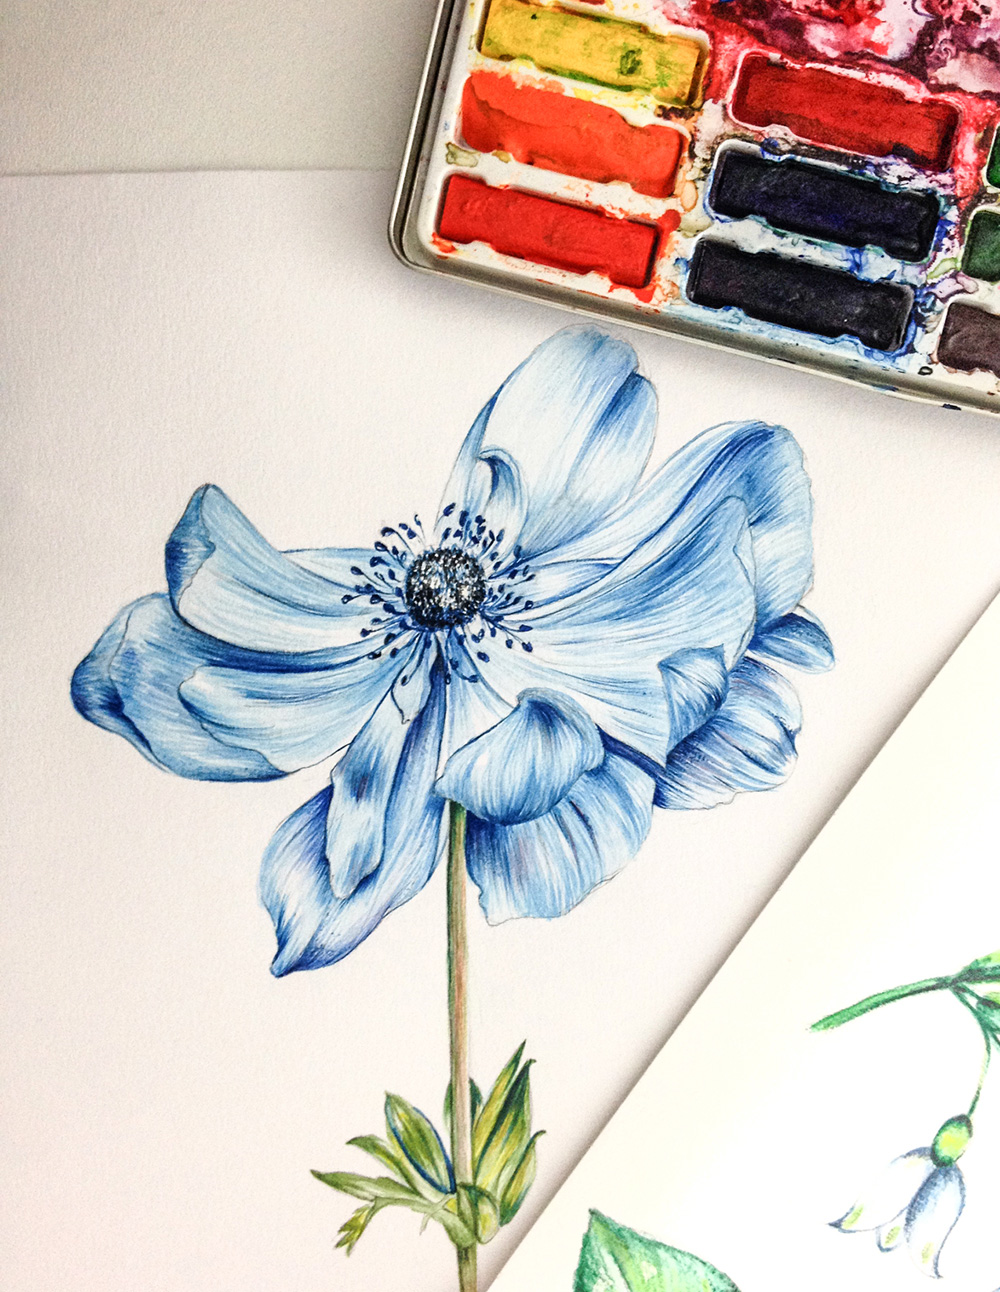 as-encantadoras-ilustracoes-de-ketlin-dafne-elainspira-4